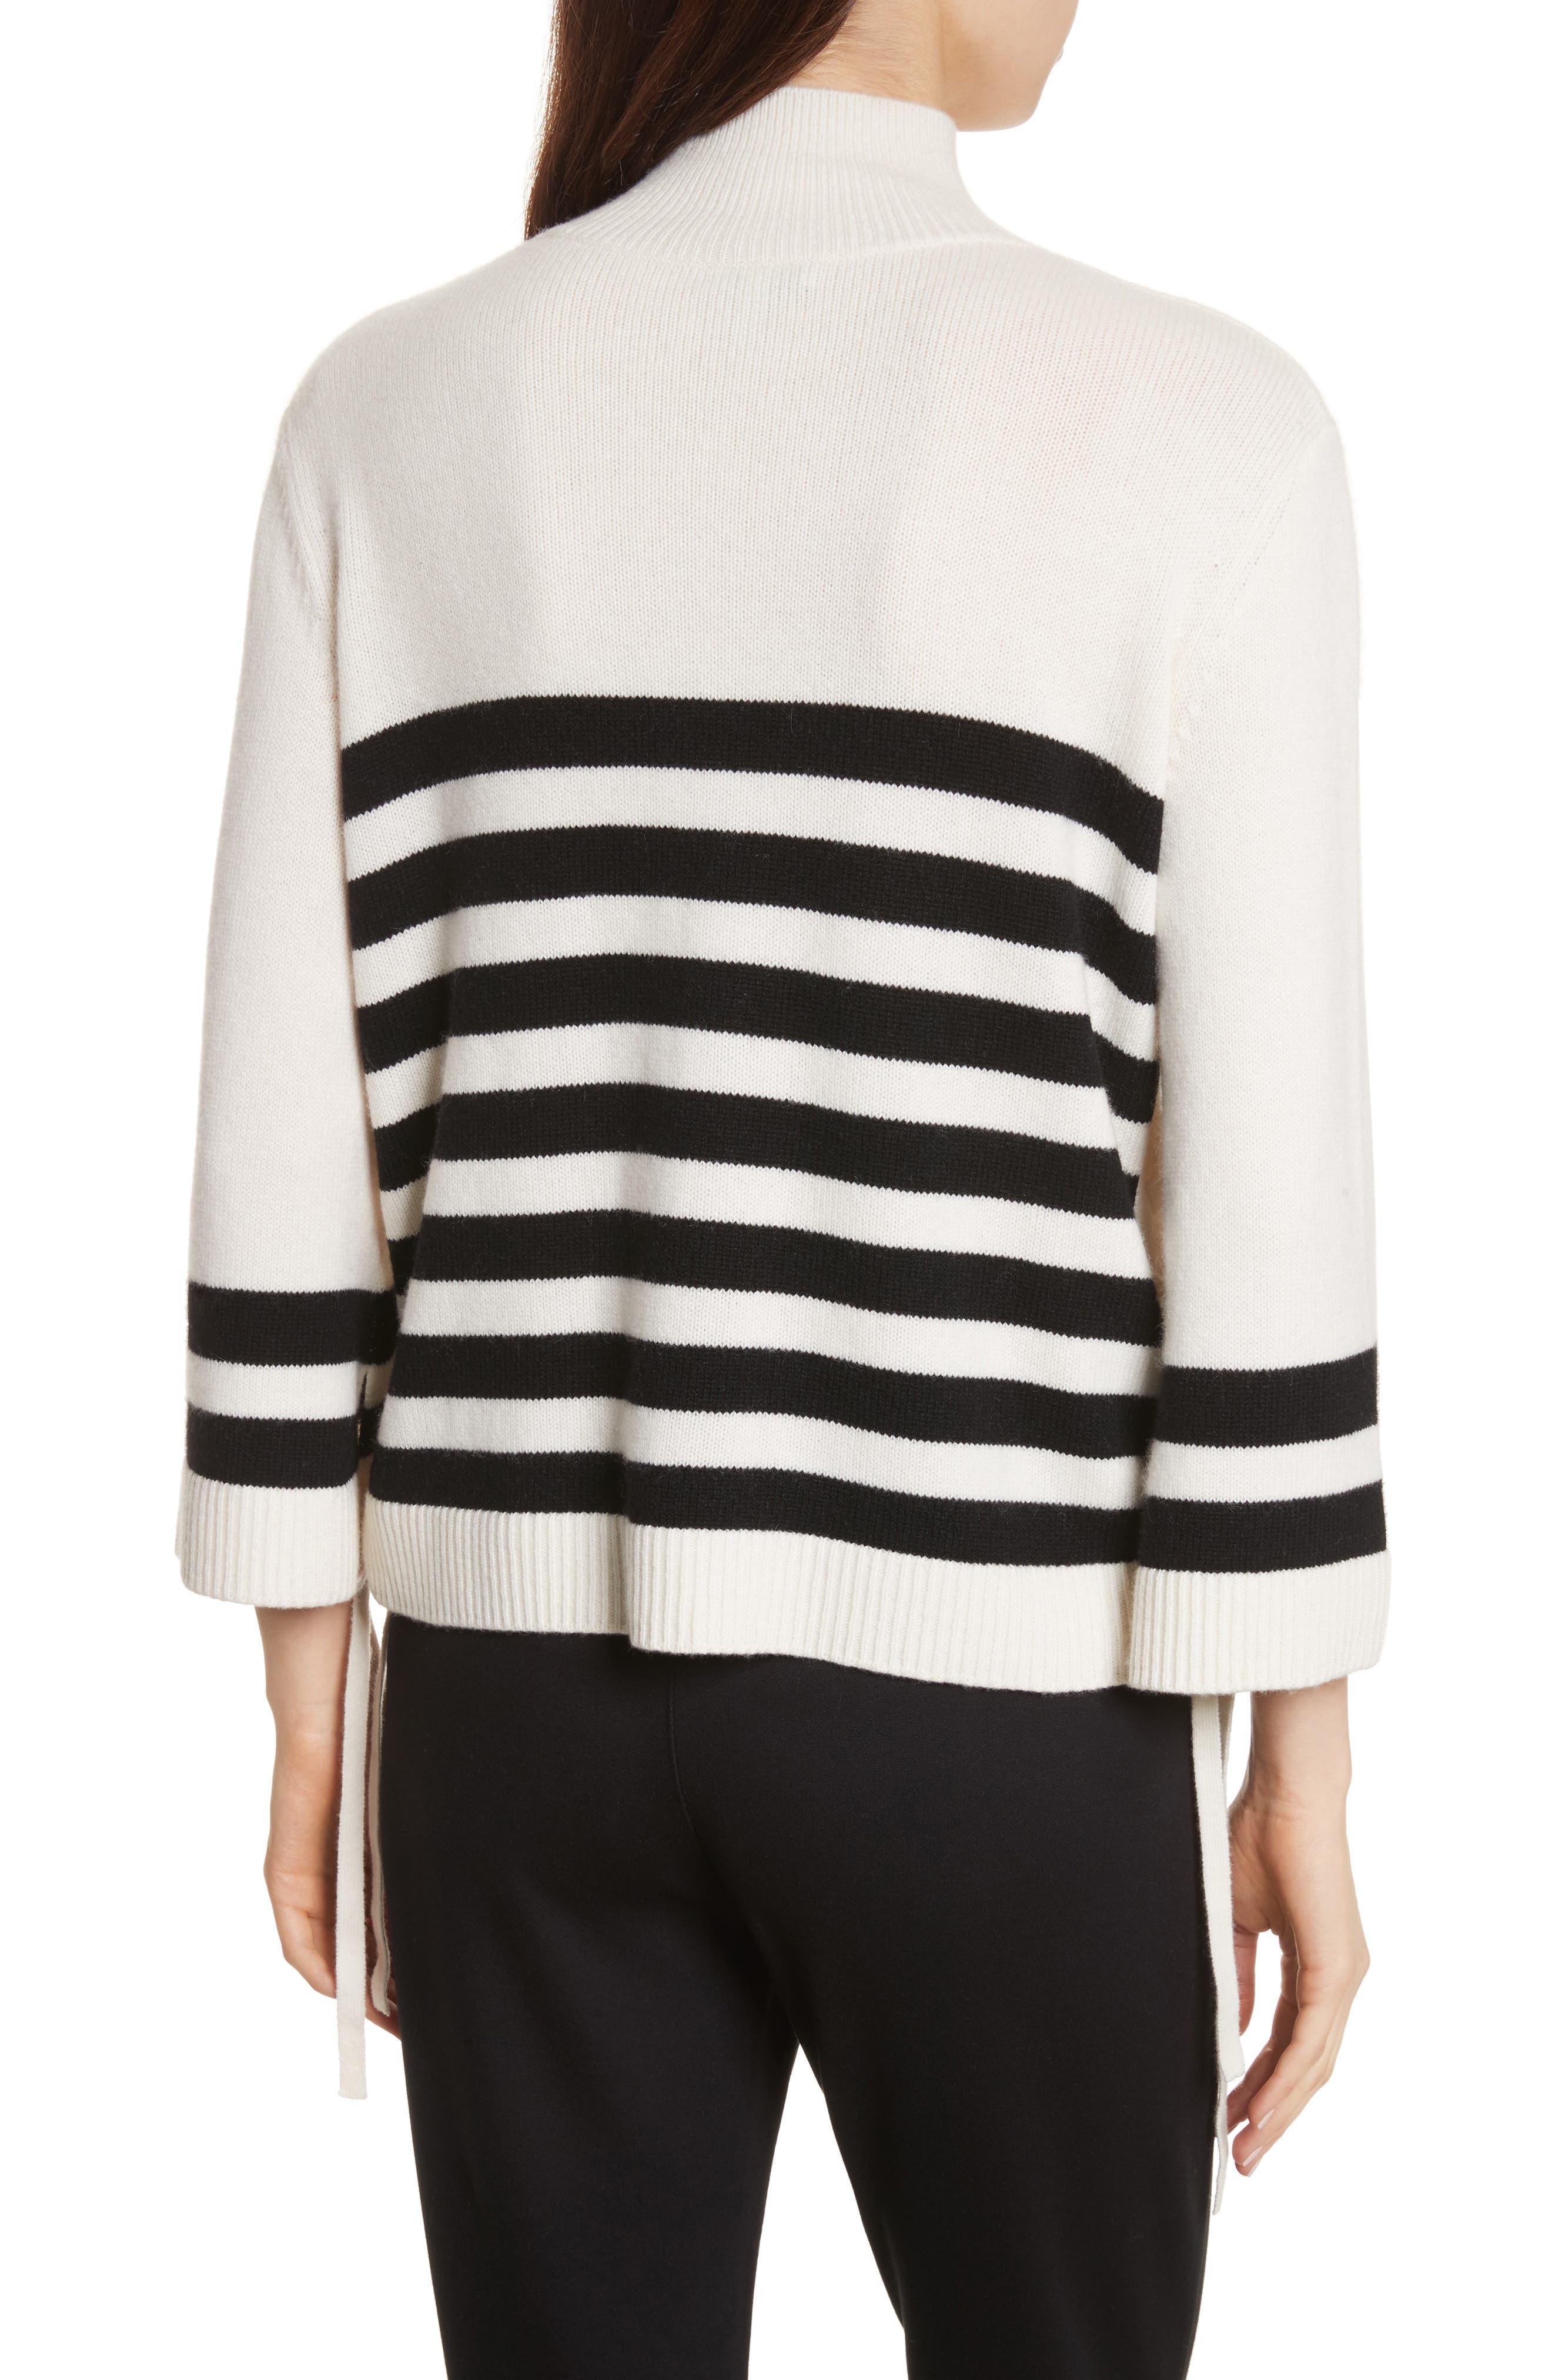 Lantz Mariner Sweater,                             Alternate thumbnail 2, color,                             Porcelain/ Caviar